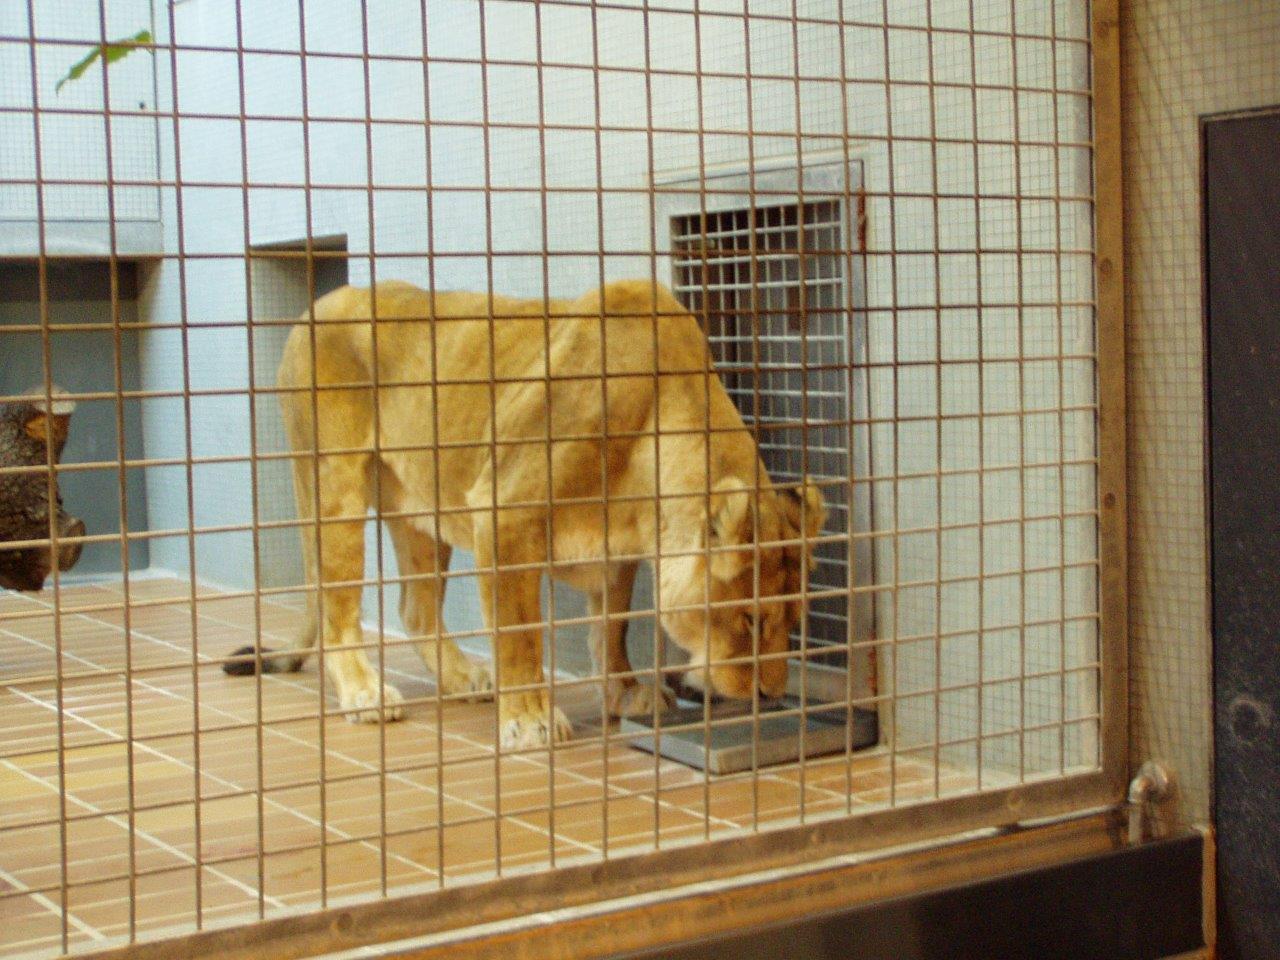 Wilde Tiere verbringen in Zoos ihr Leben hinter Gittern. Foto: (c) PETA